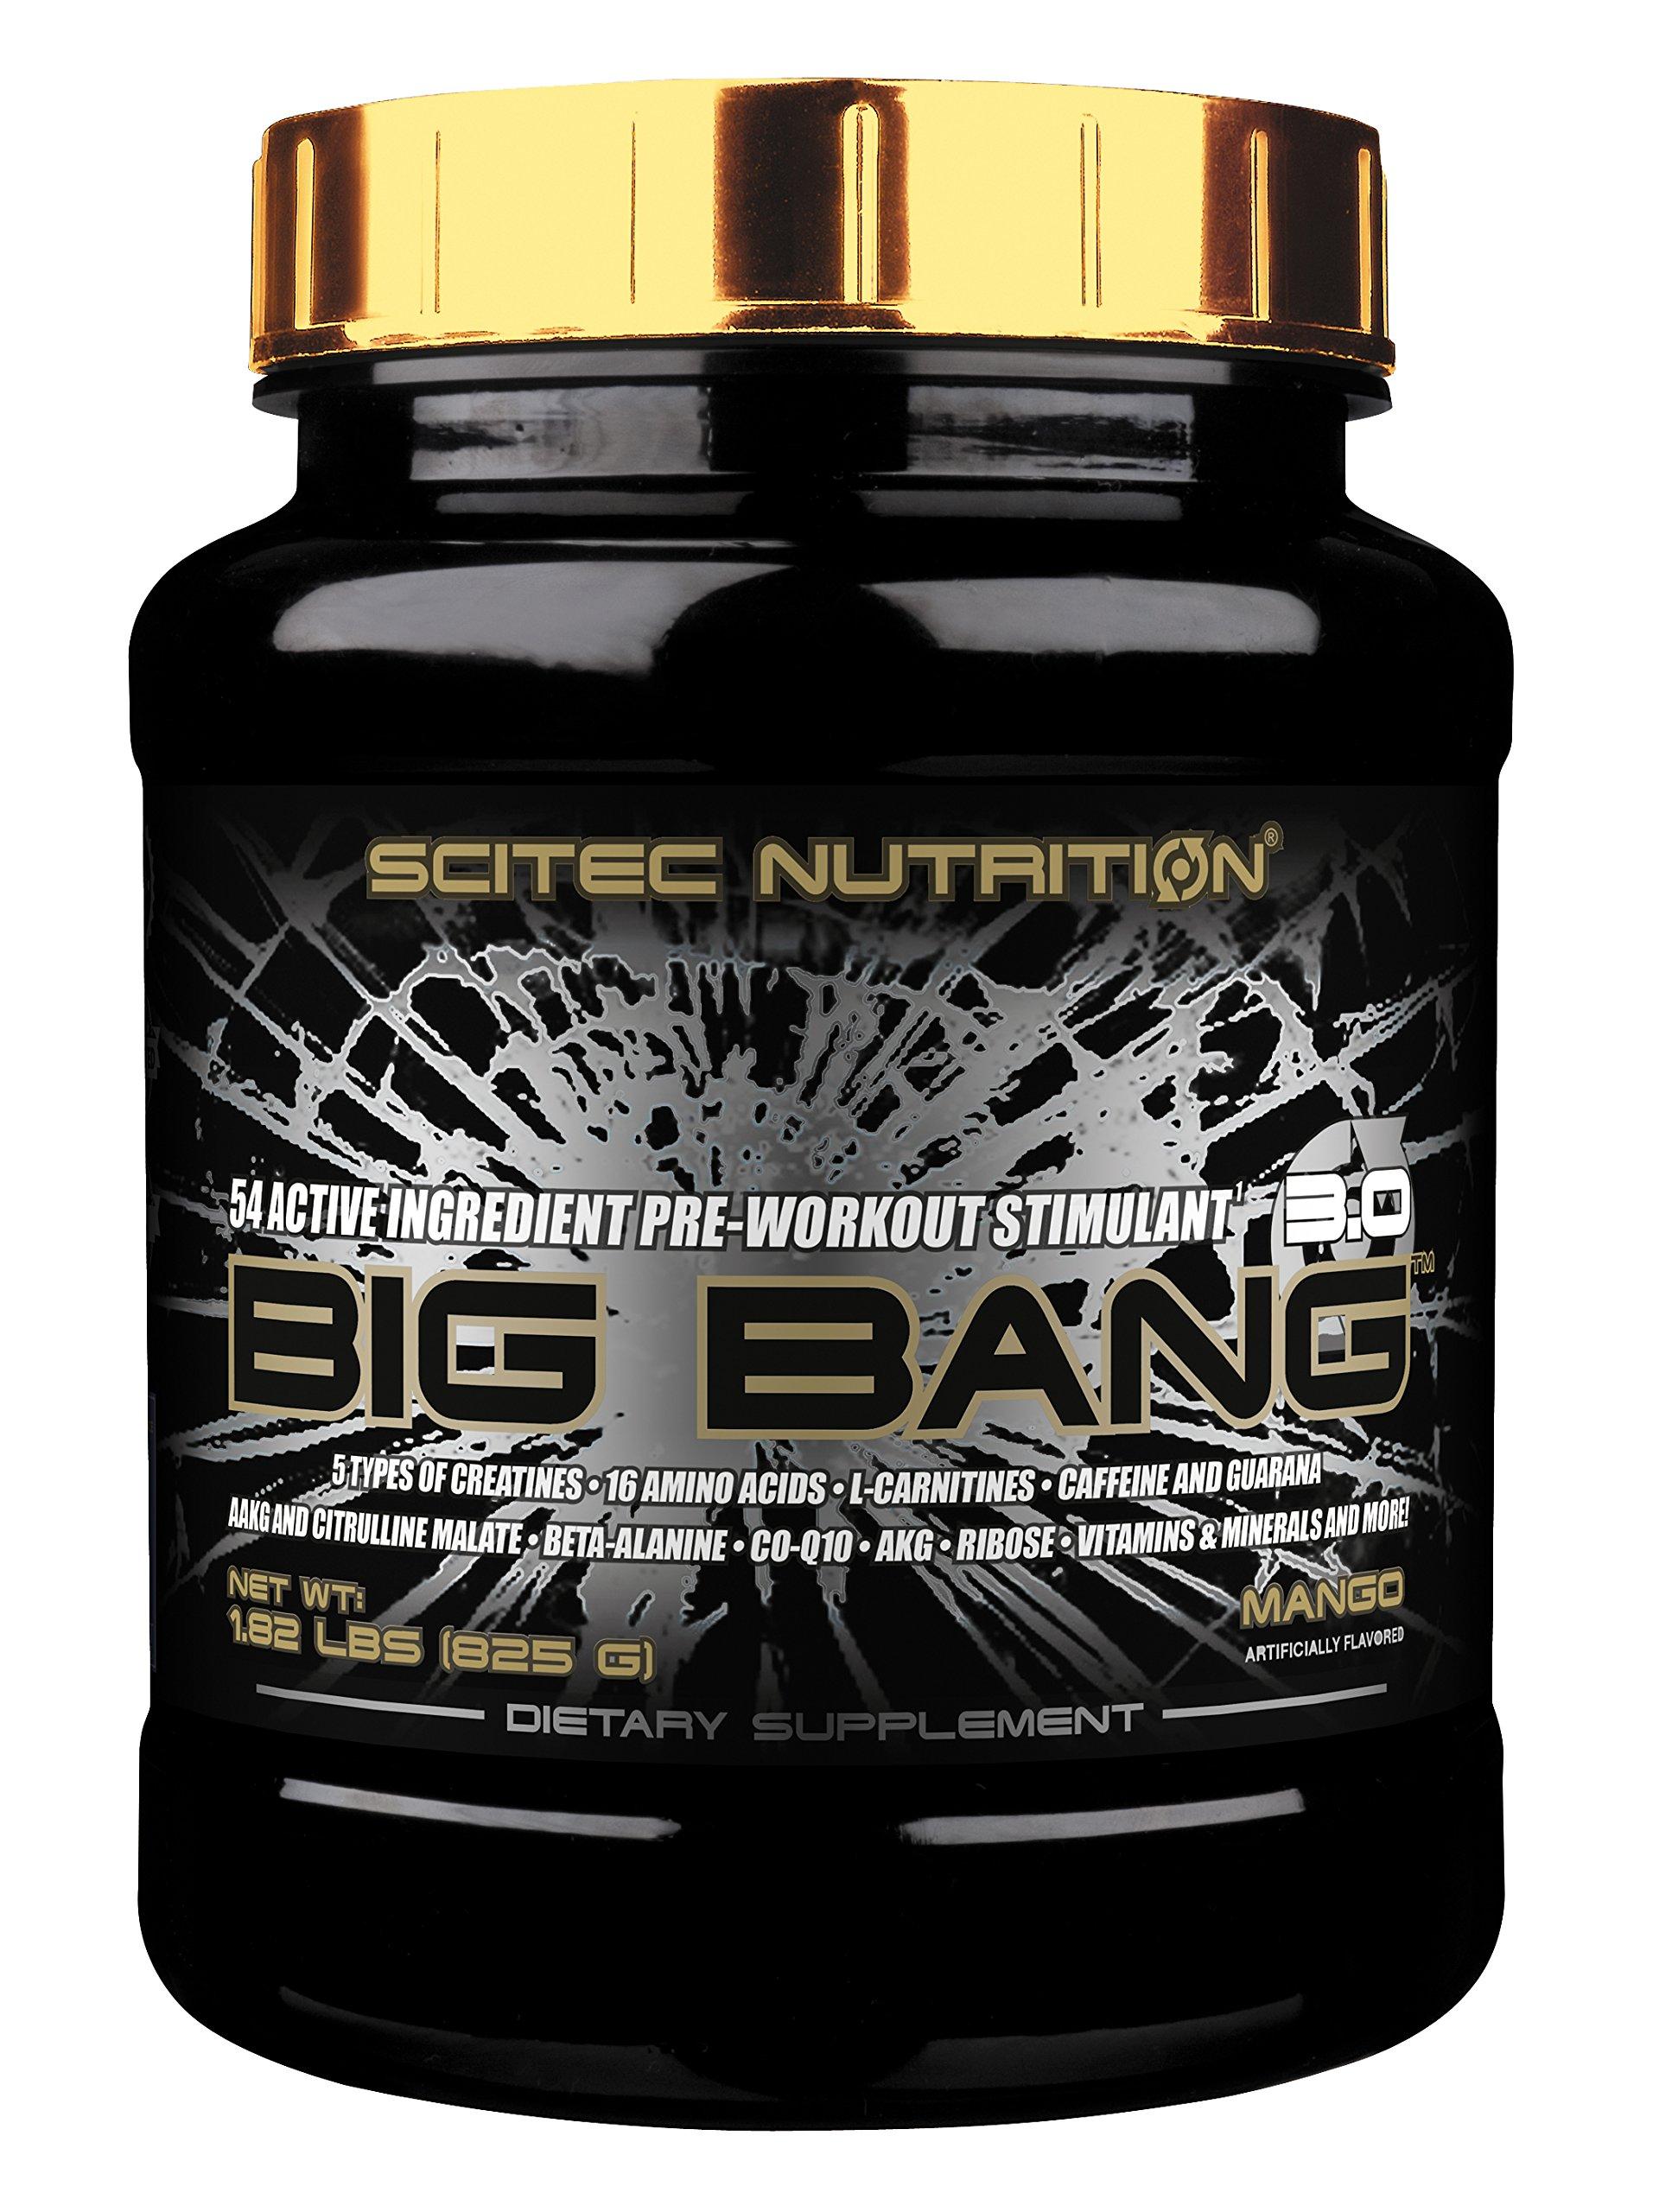 Scitec Nutrition BIG BANG - 1.82 Pound, Mango (Pre-Workout Stimulant)